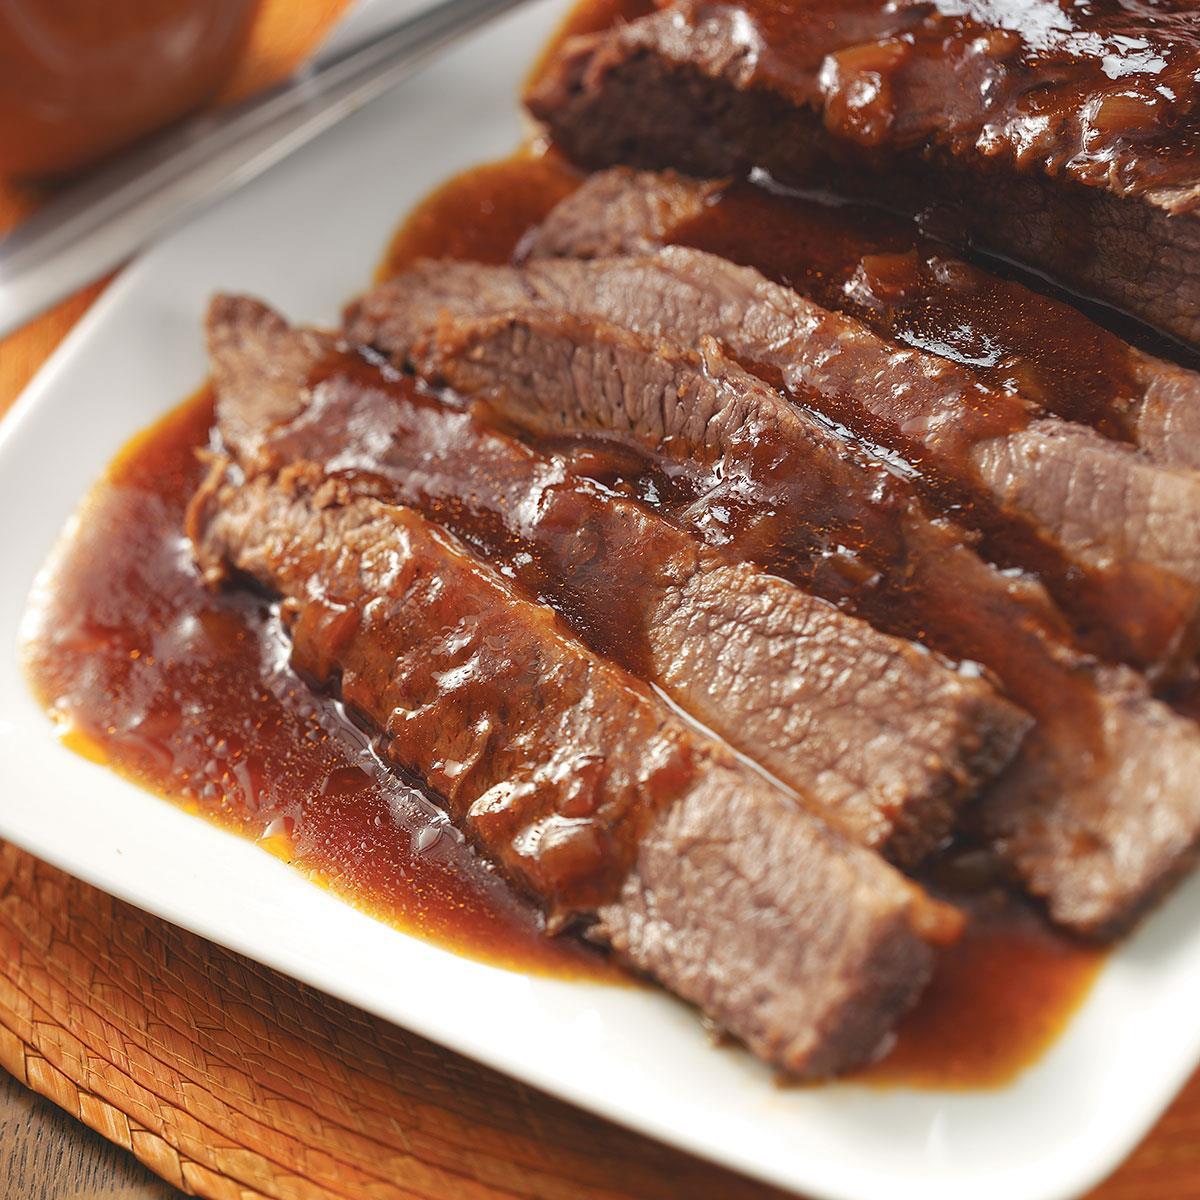 Bbq Beef Brisket Recipe  Barbecue Beef Brisket Recipe